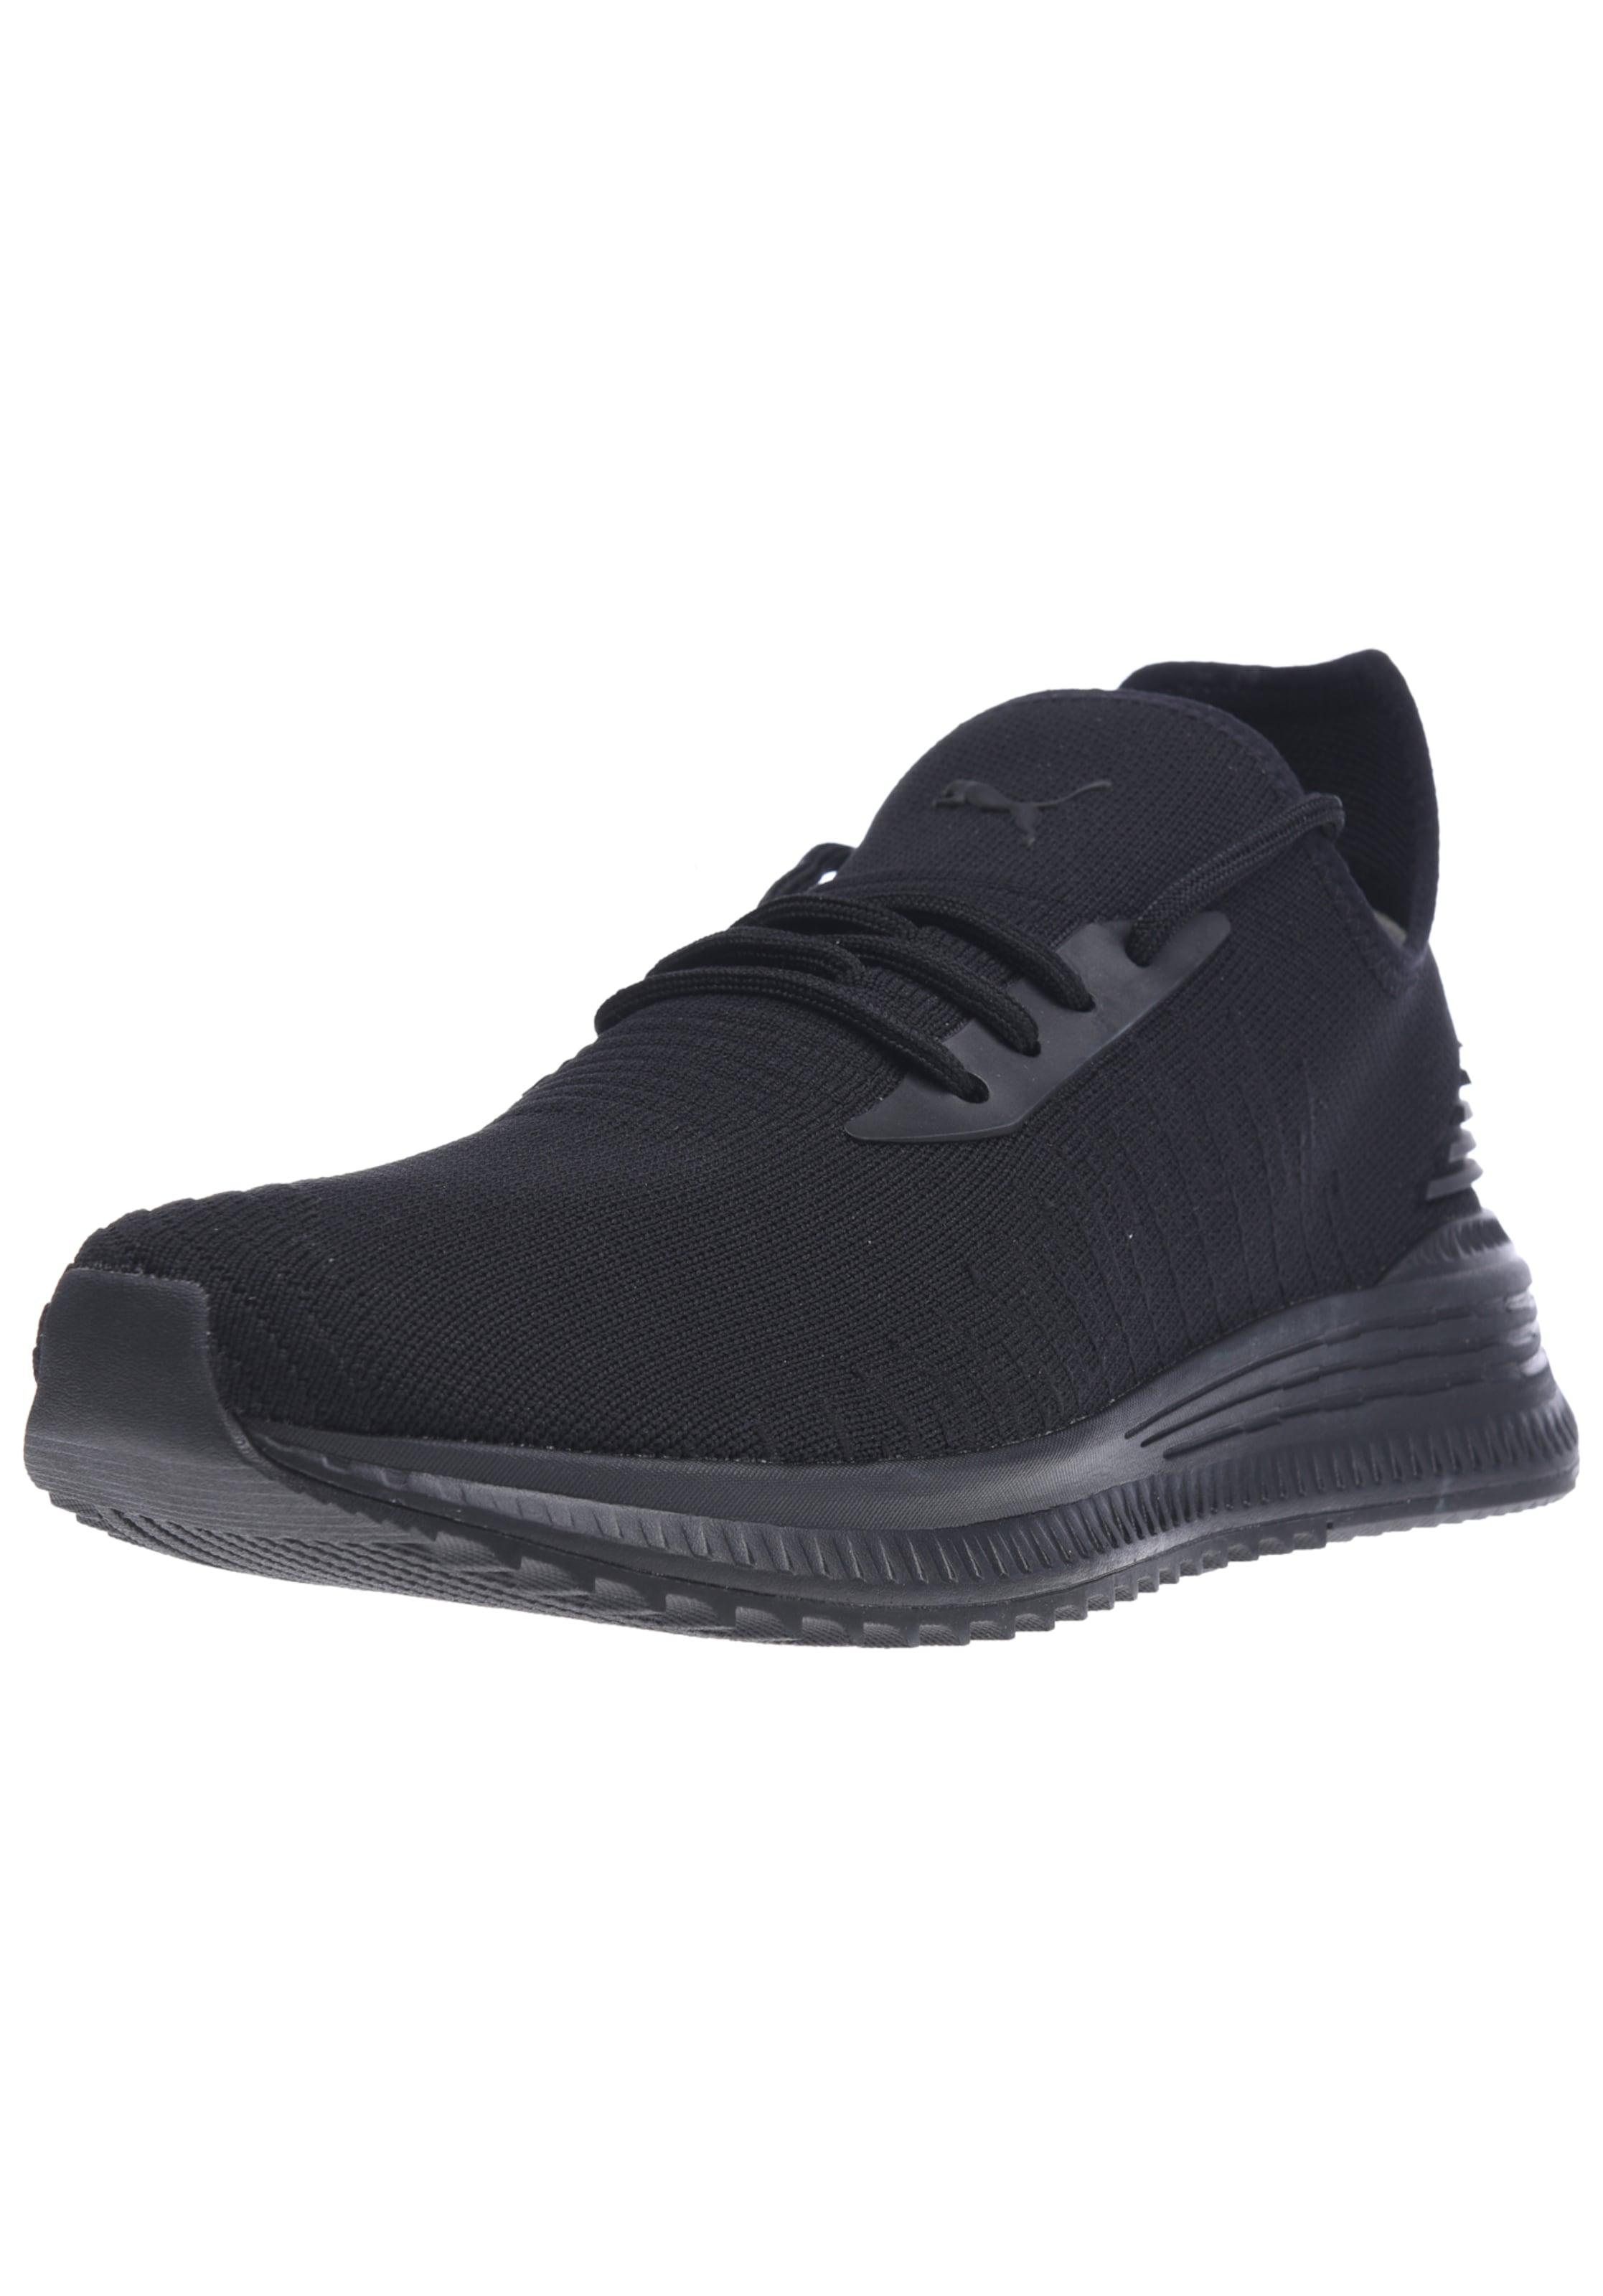 PUMA Avid Evo Knit Sneaker Hohe Qualität